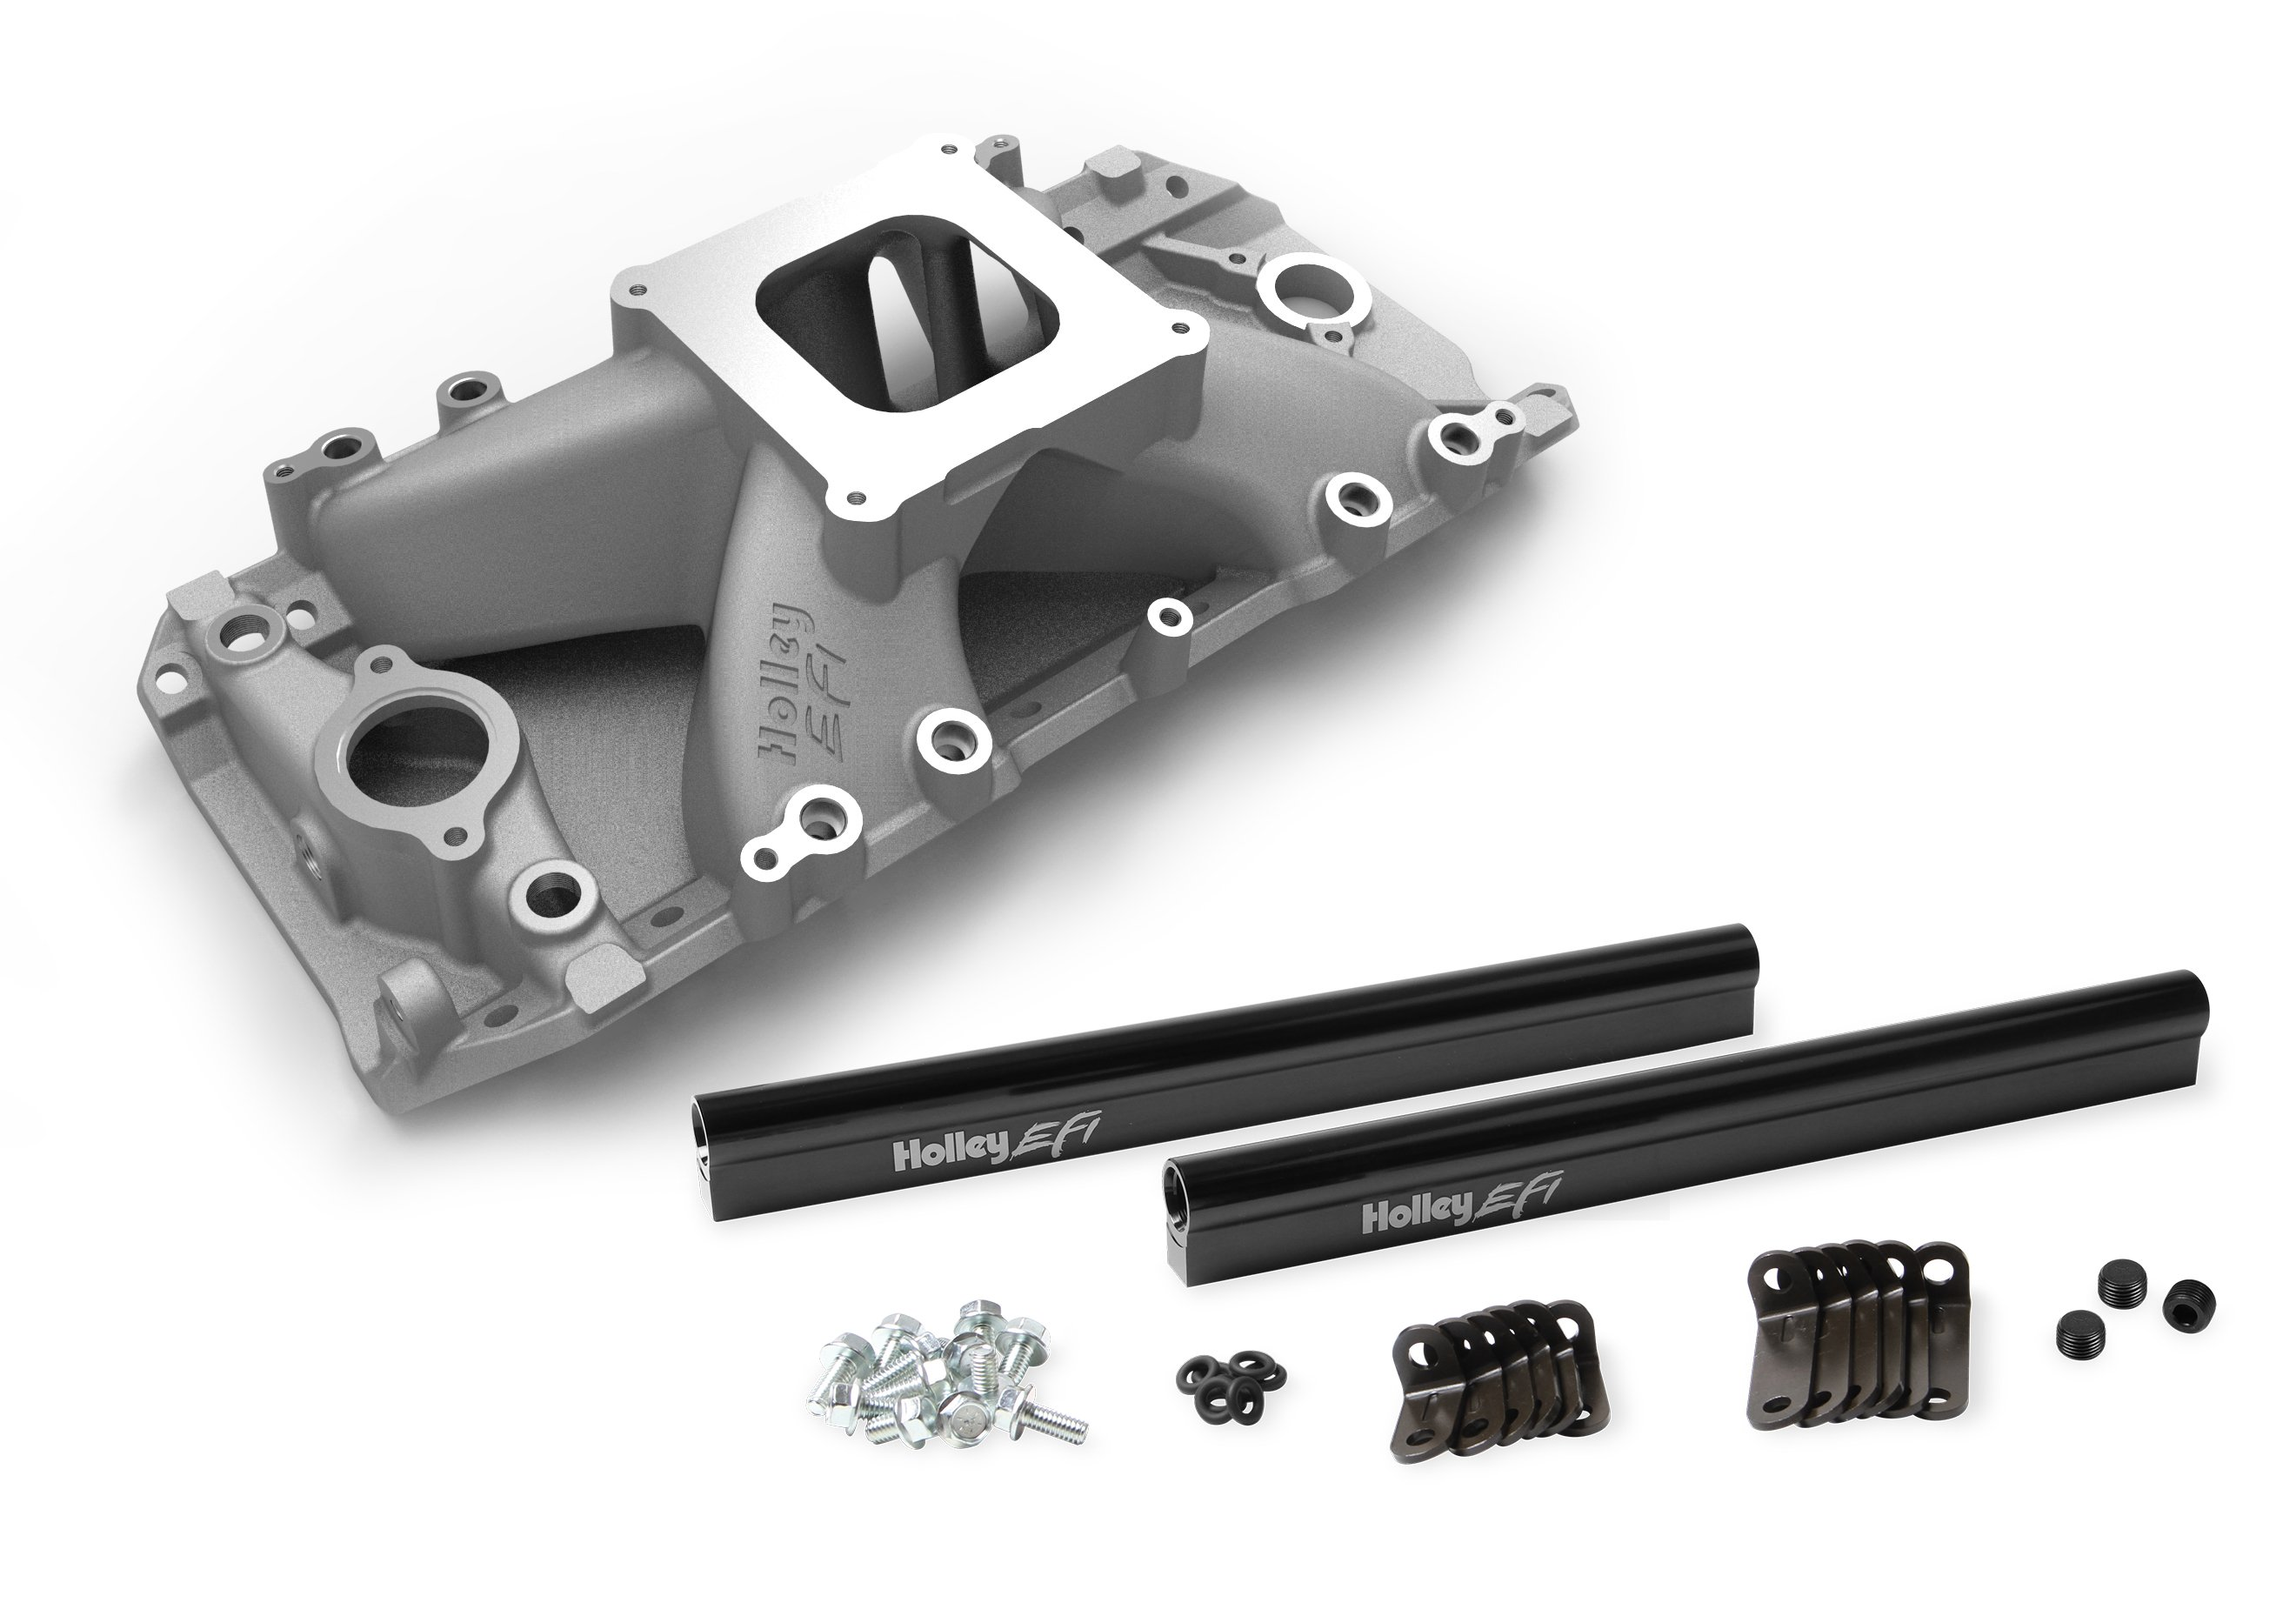 Holley EFI Intake - Chevy Big Block V8 EFI